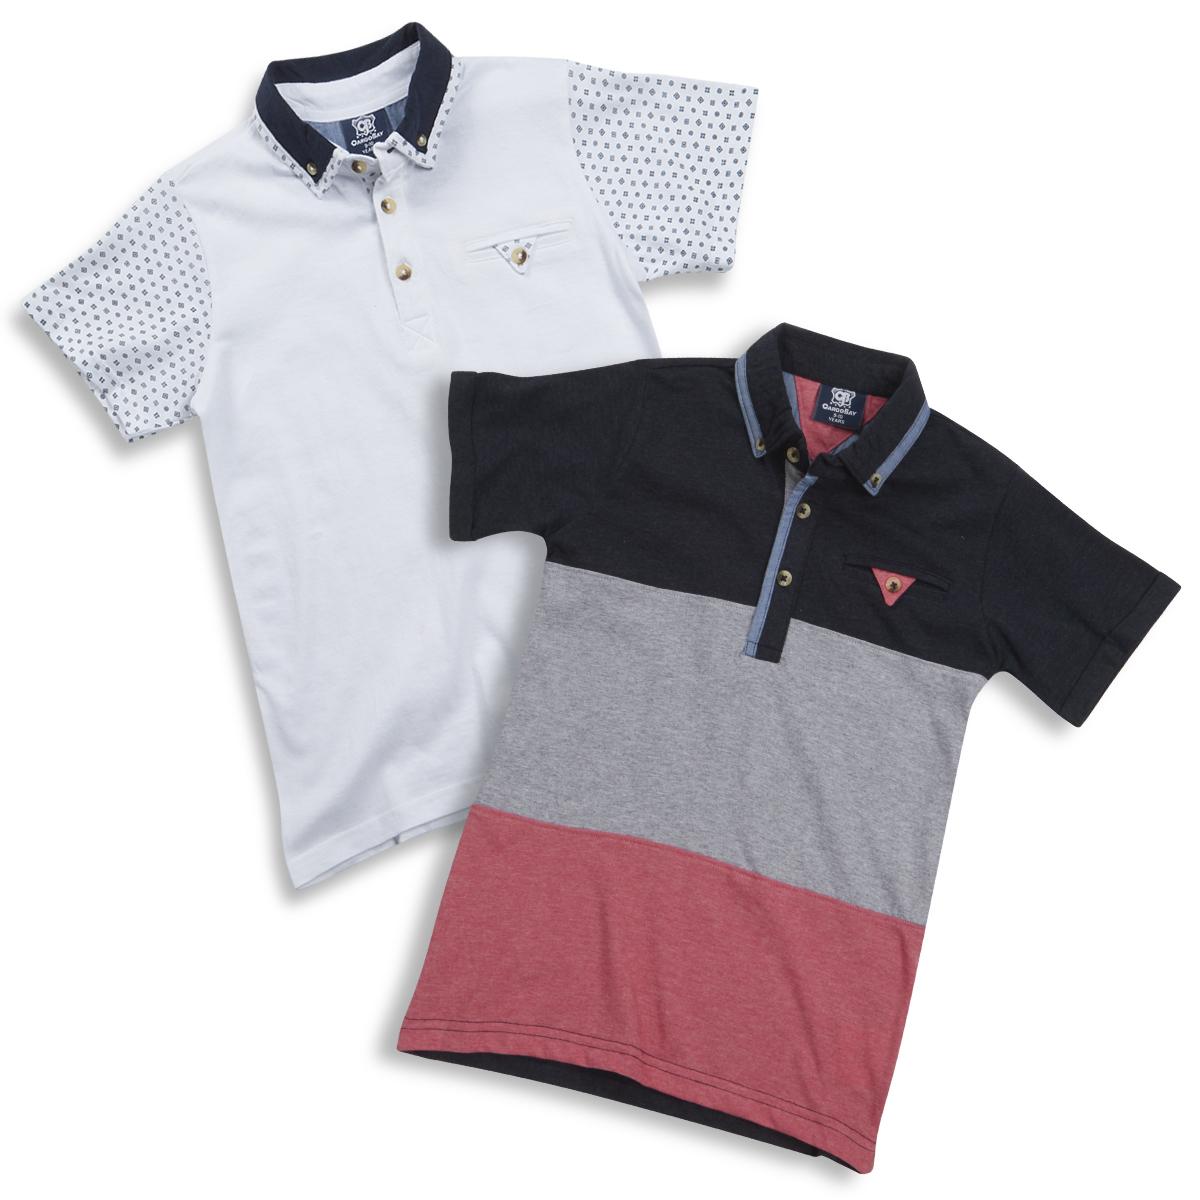 Babytown Baby Boys Short Sleeve Polo Shirt Button Down Collar